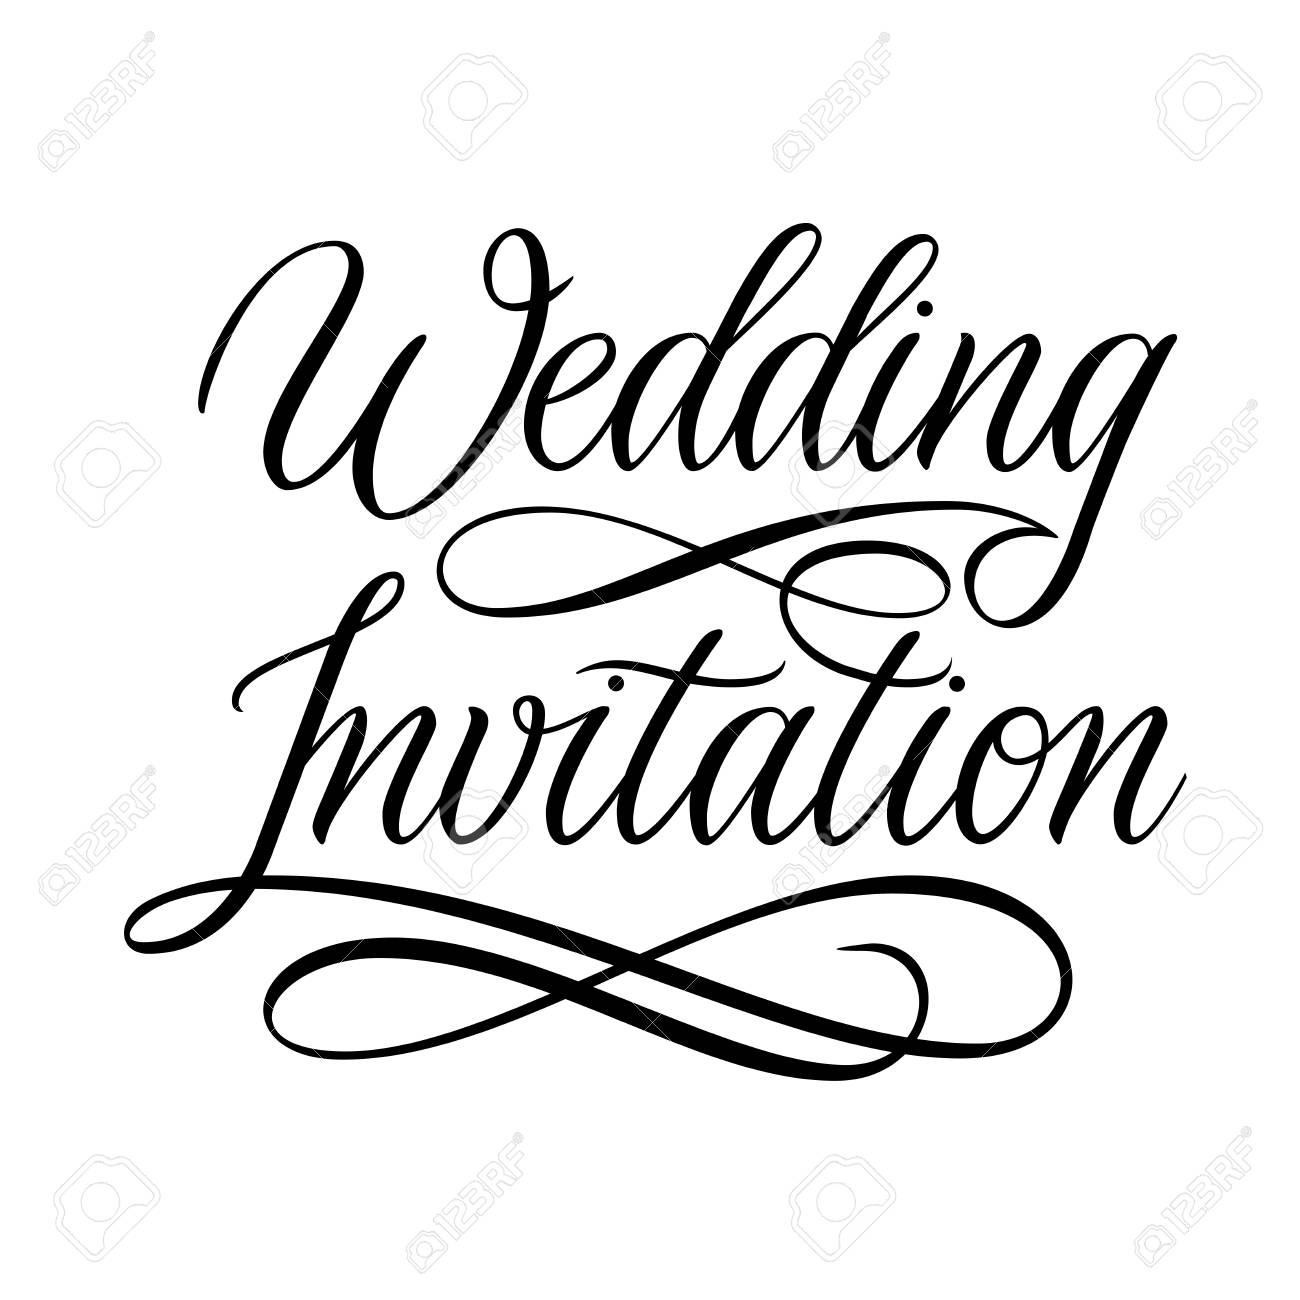 wedding invitation design black and